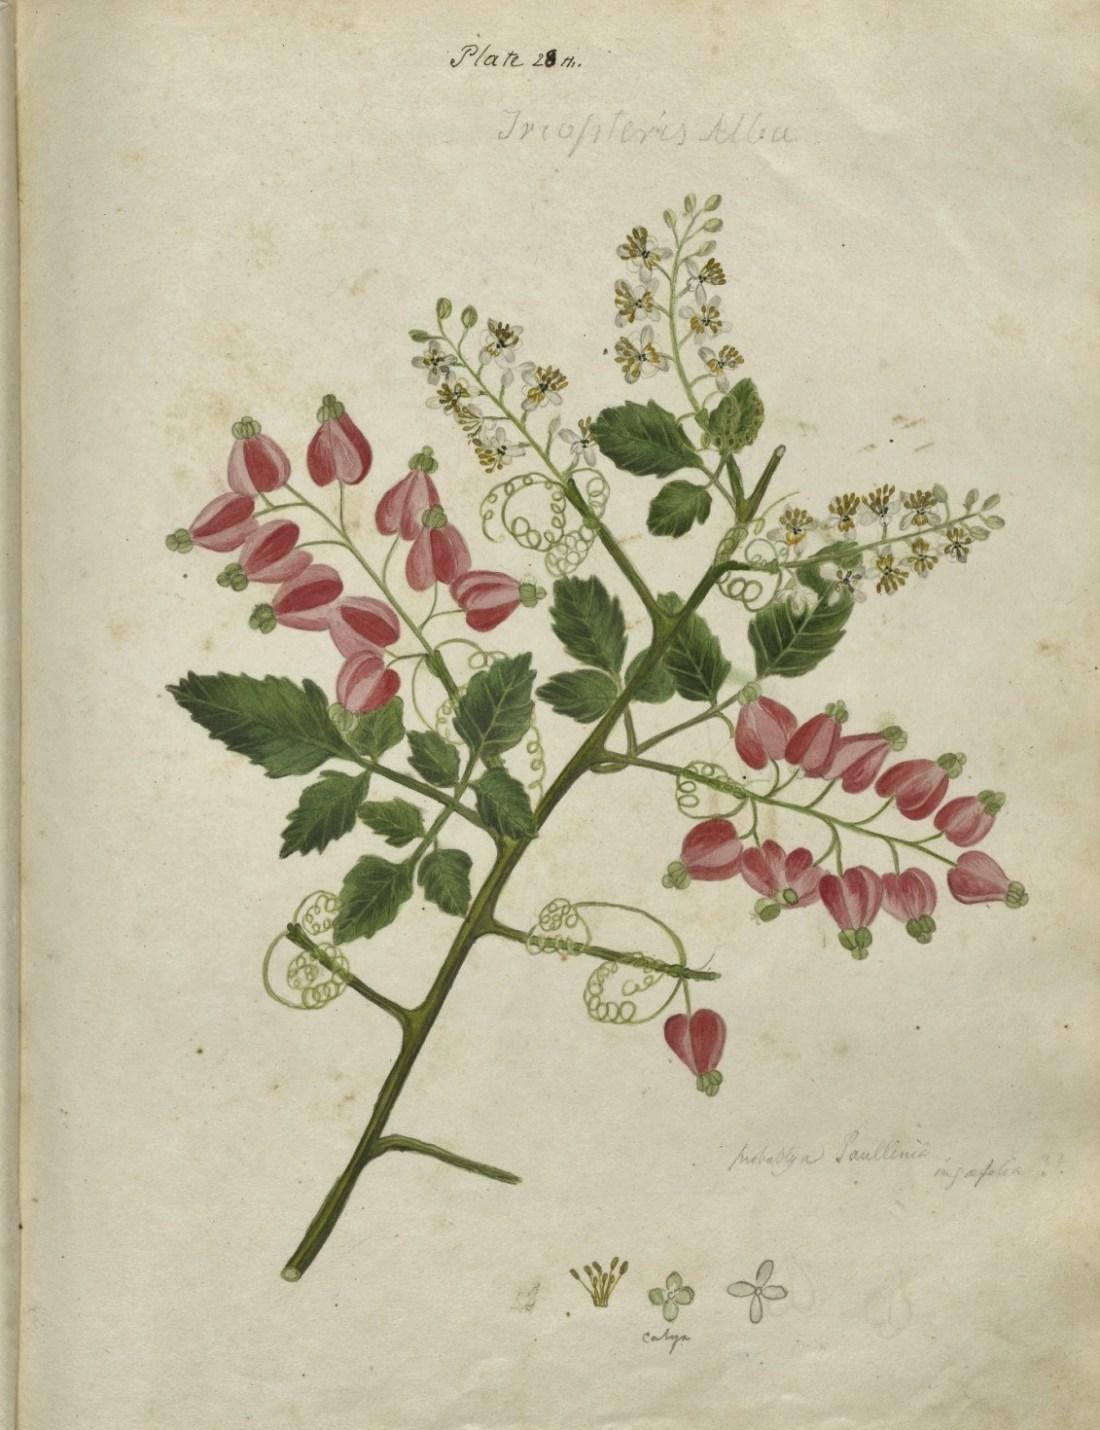 Tropteris alba. Plate 28. 117.